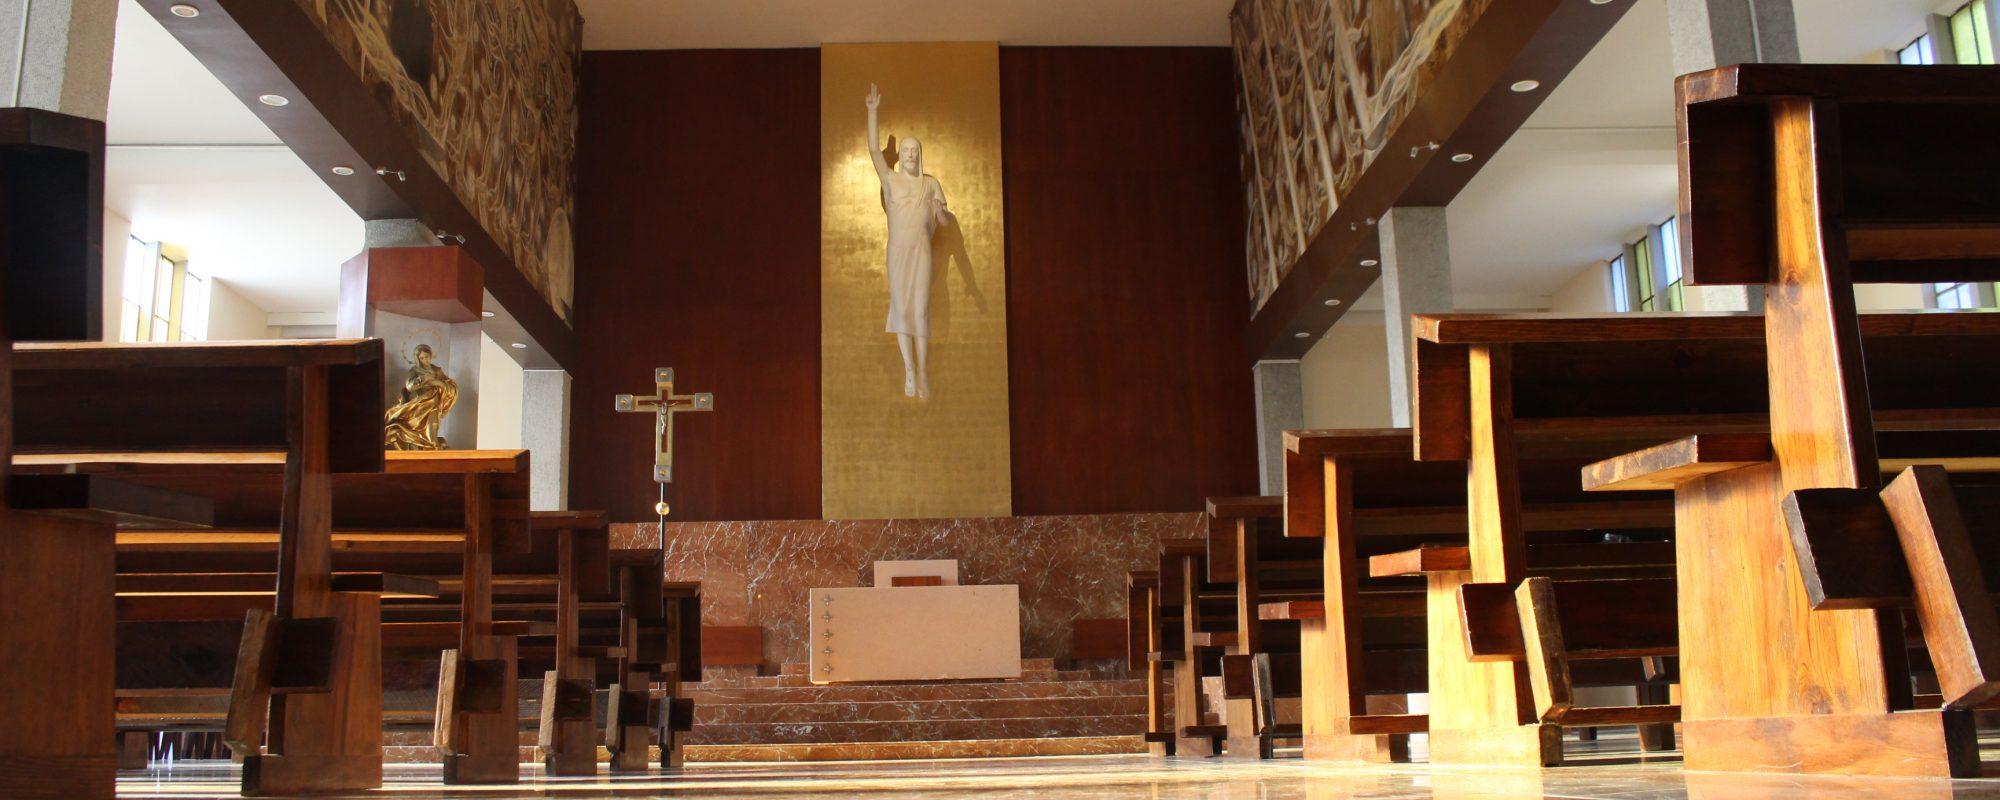 capilla del seminario de zacatecas